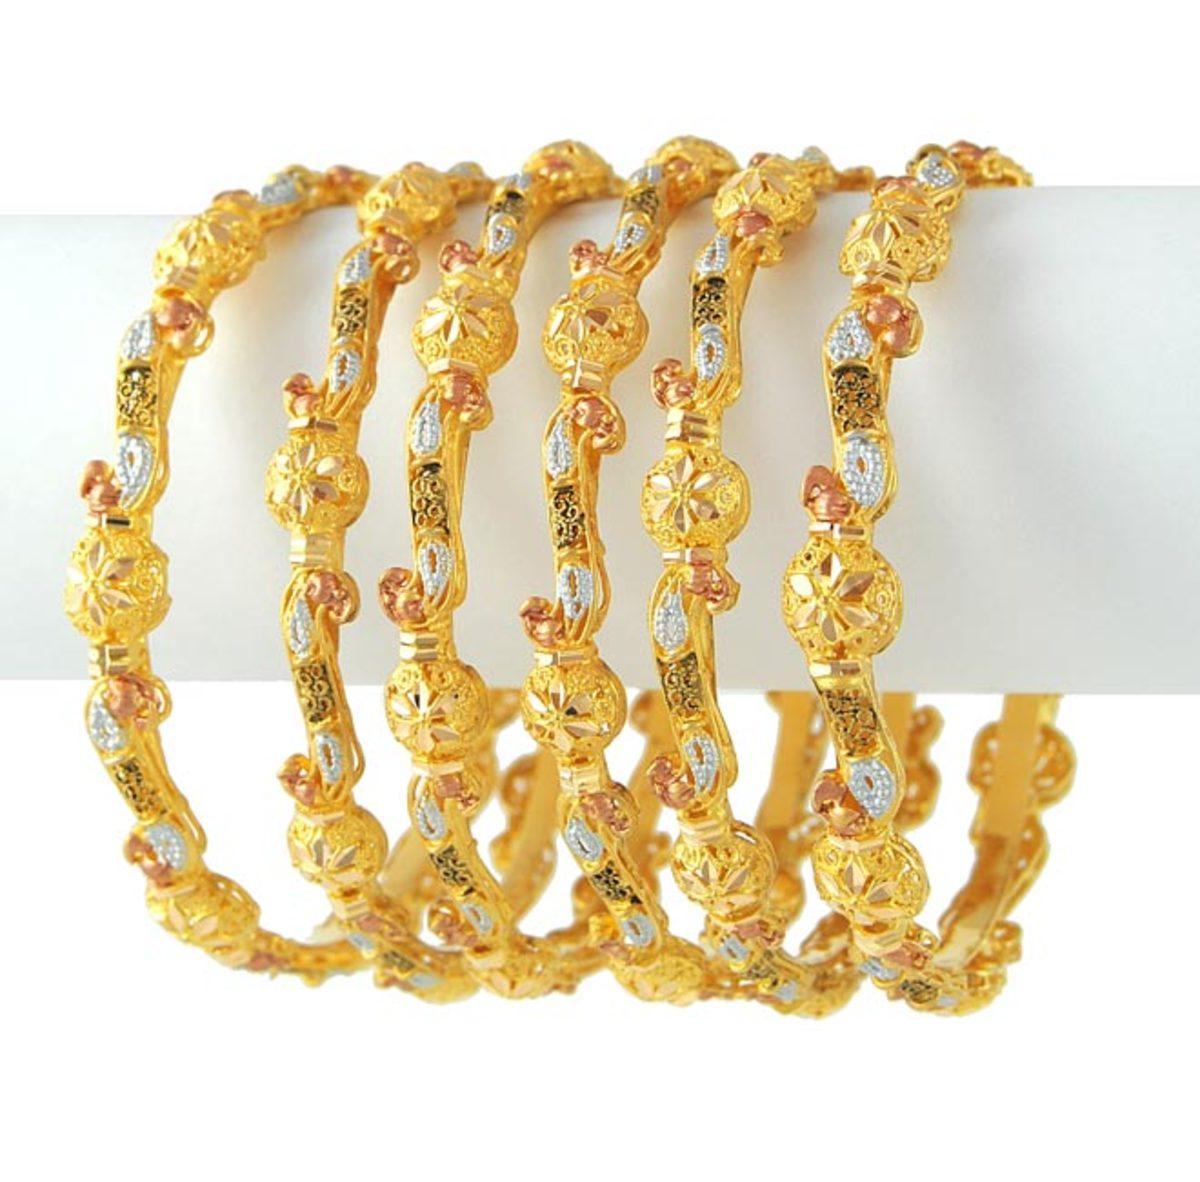 Half a dozen gold bangles